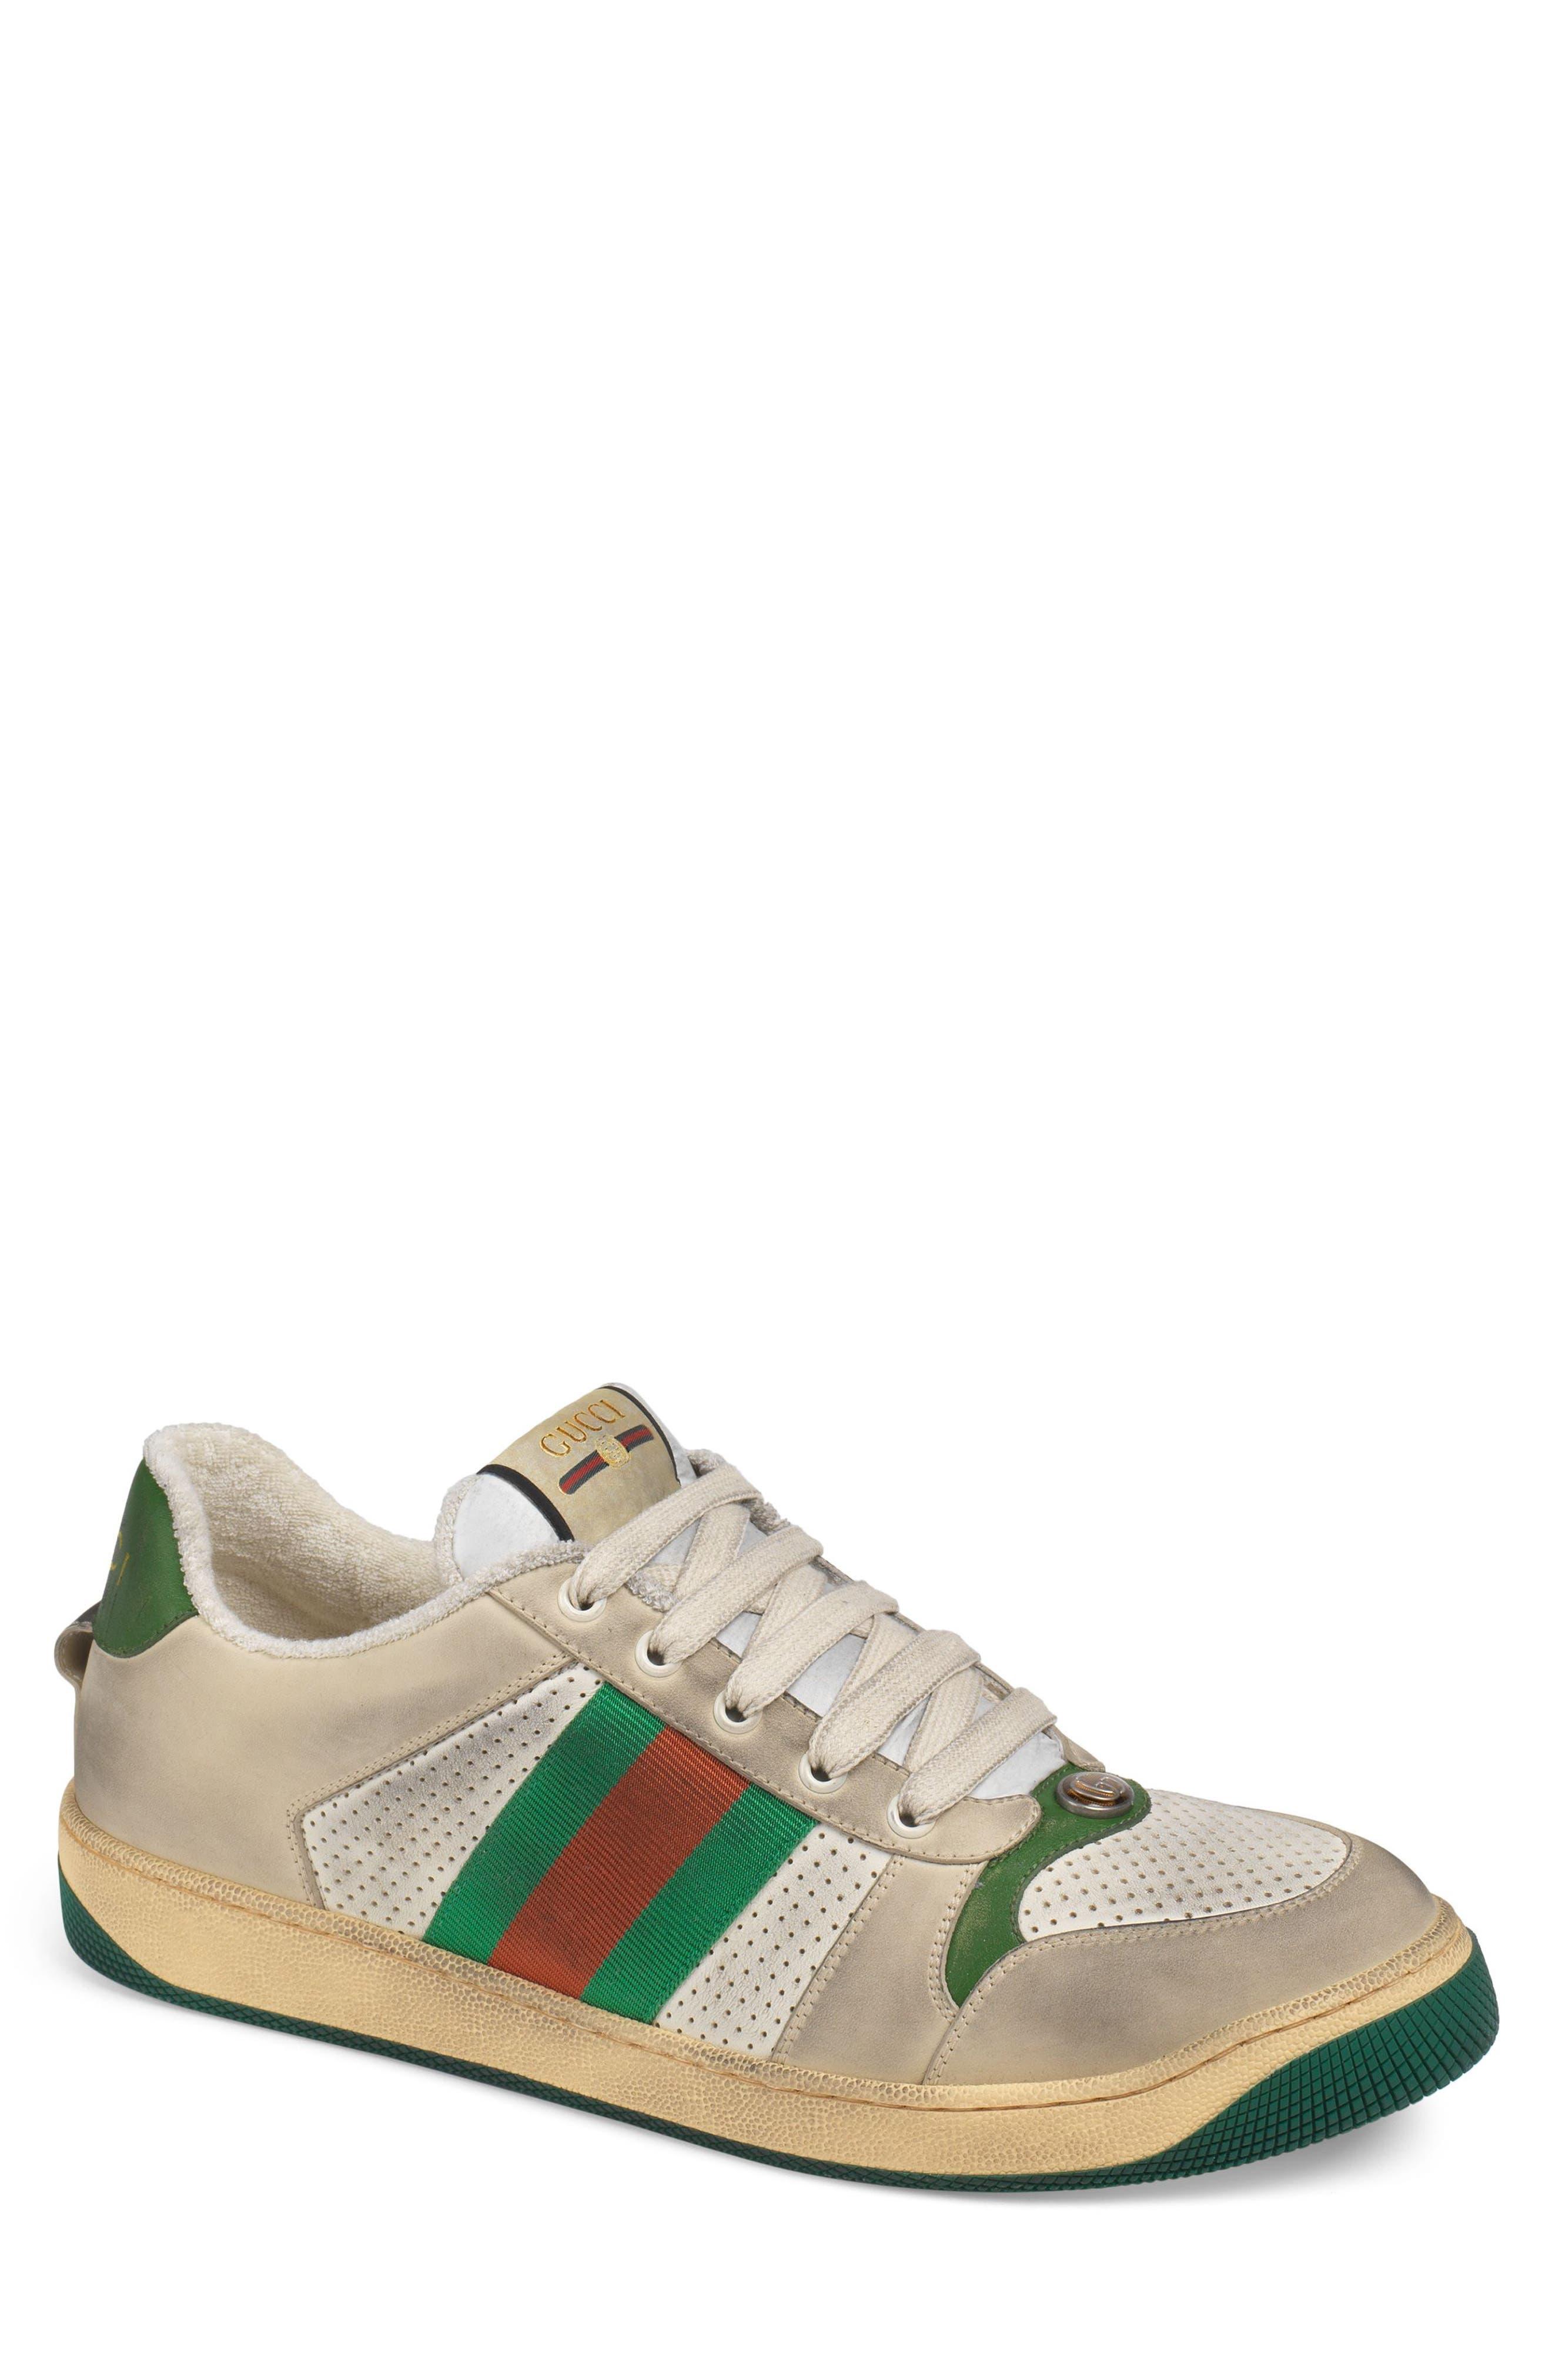 Screener Jewel Sneaker,                             Alternate thumbnail 2, color,                             BEIGE/ GREEN/ RED